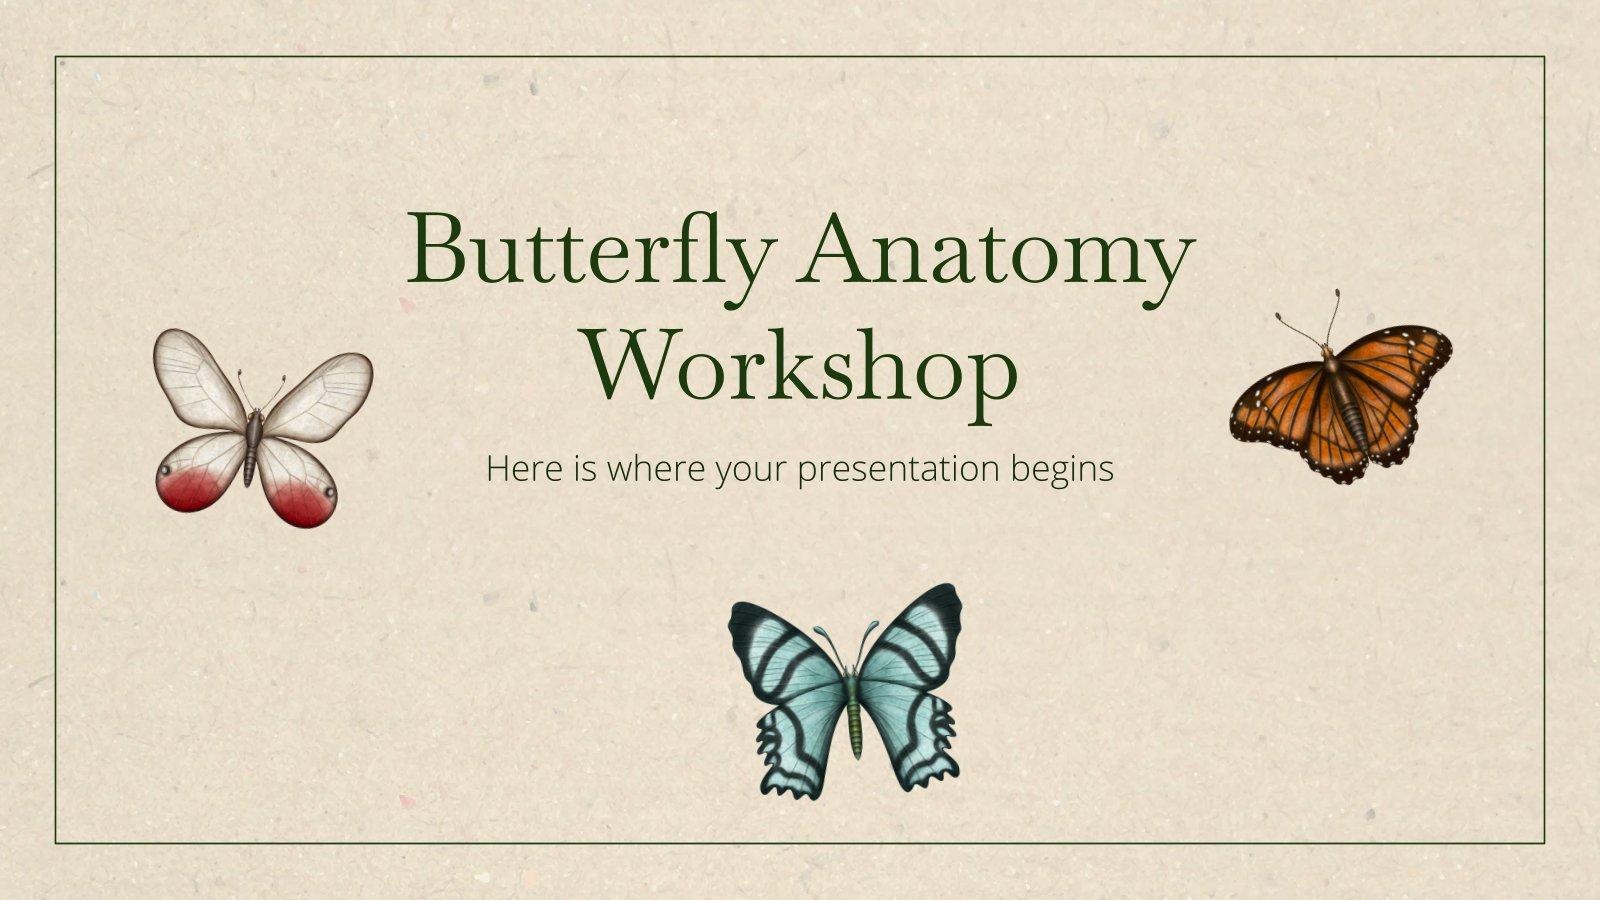 Butterfly Anatomy Workshop presentation template